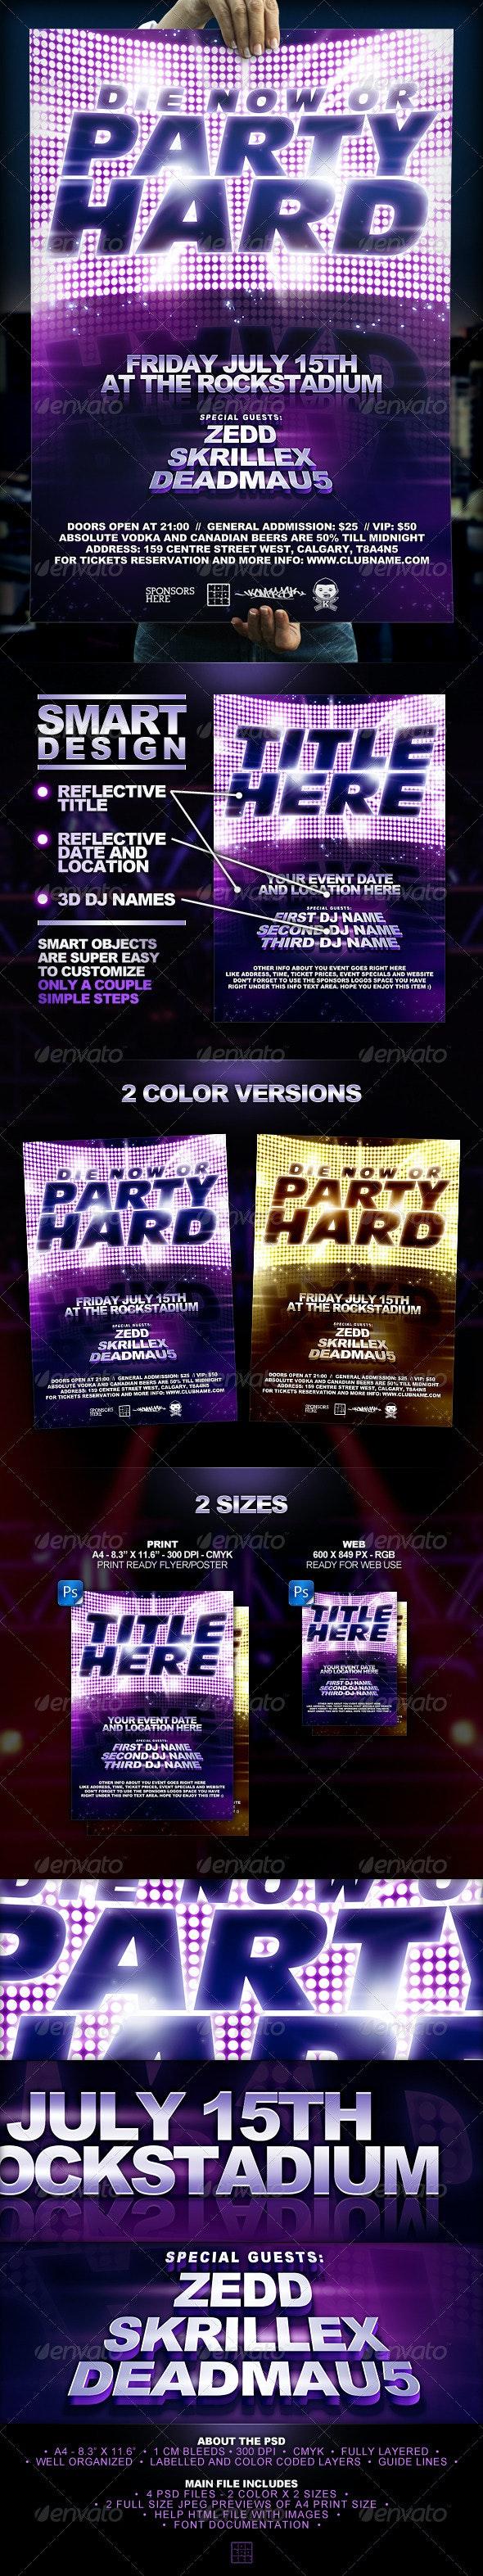 Superstar Flyer Template - Clubs & Parties Events